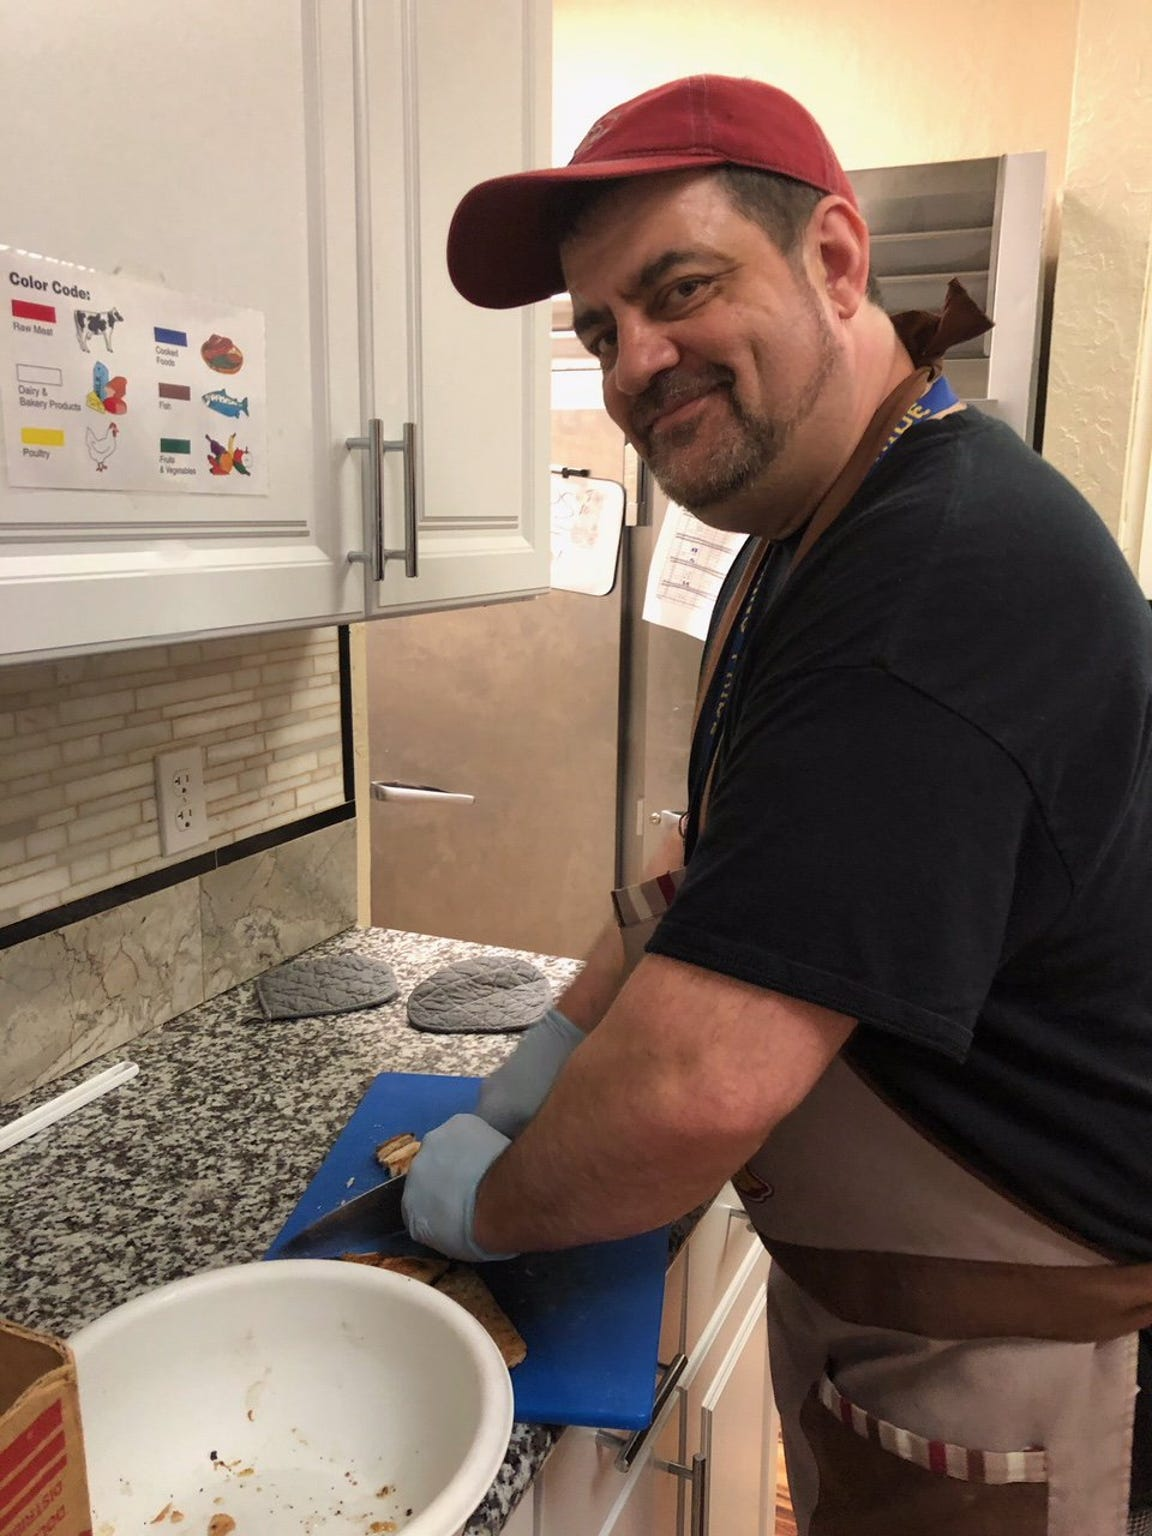 Patrick Jones, chef at HOAP Center